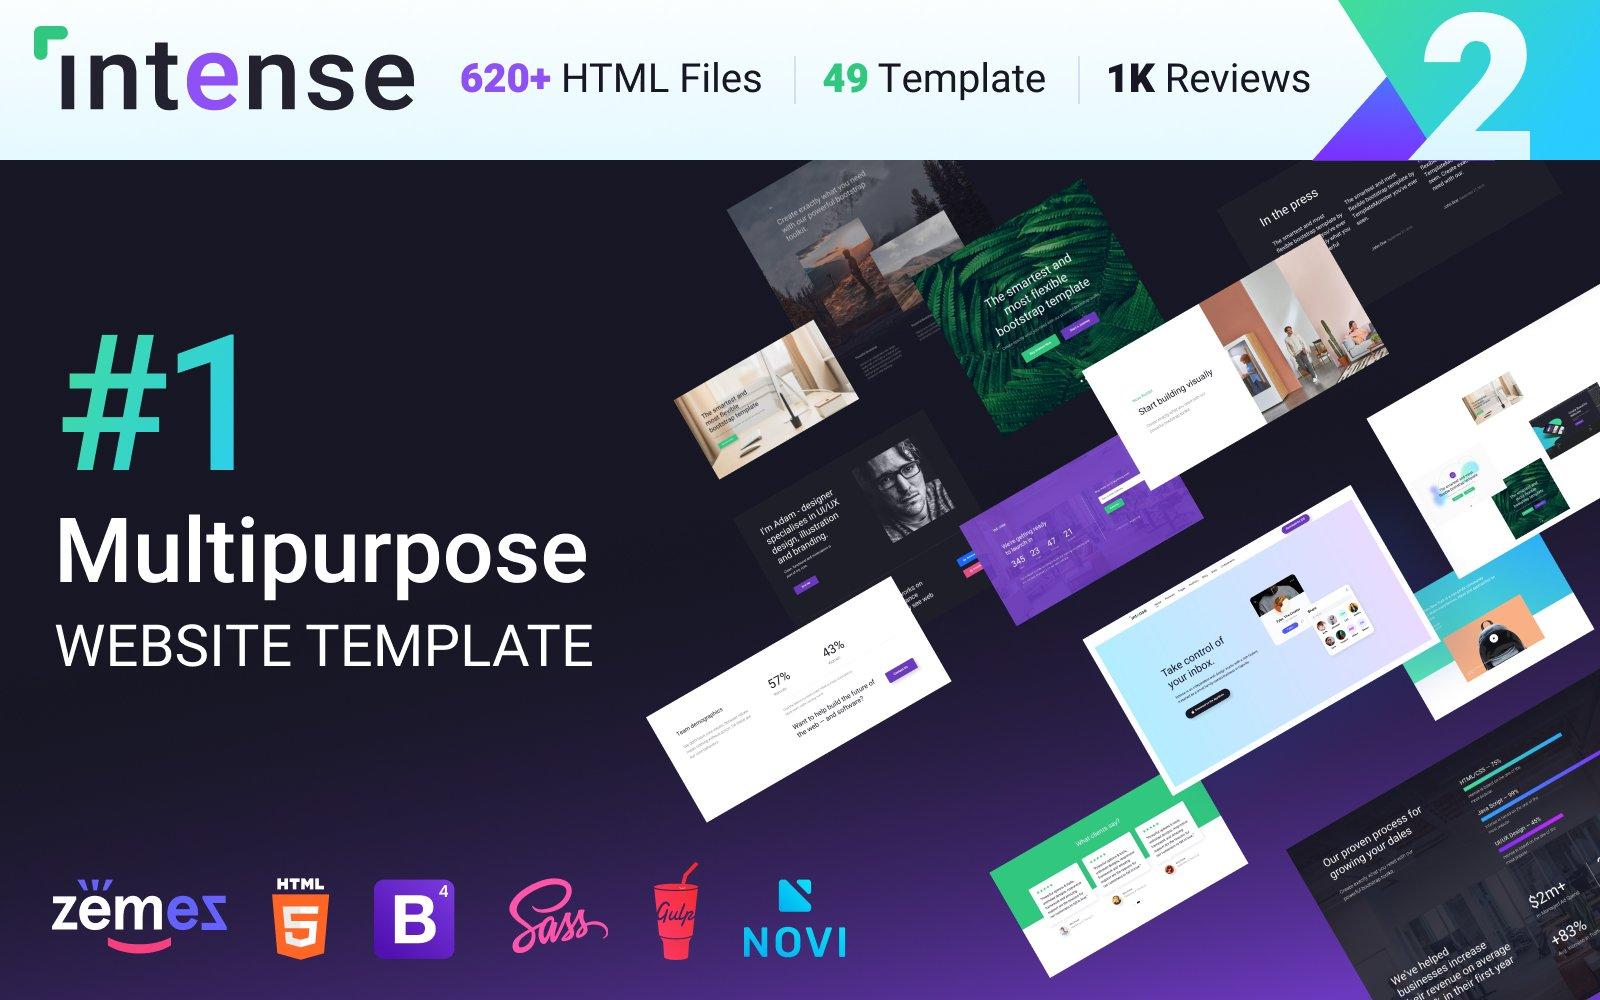 webseiten template - Leon.escapers.co